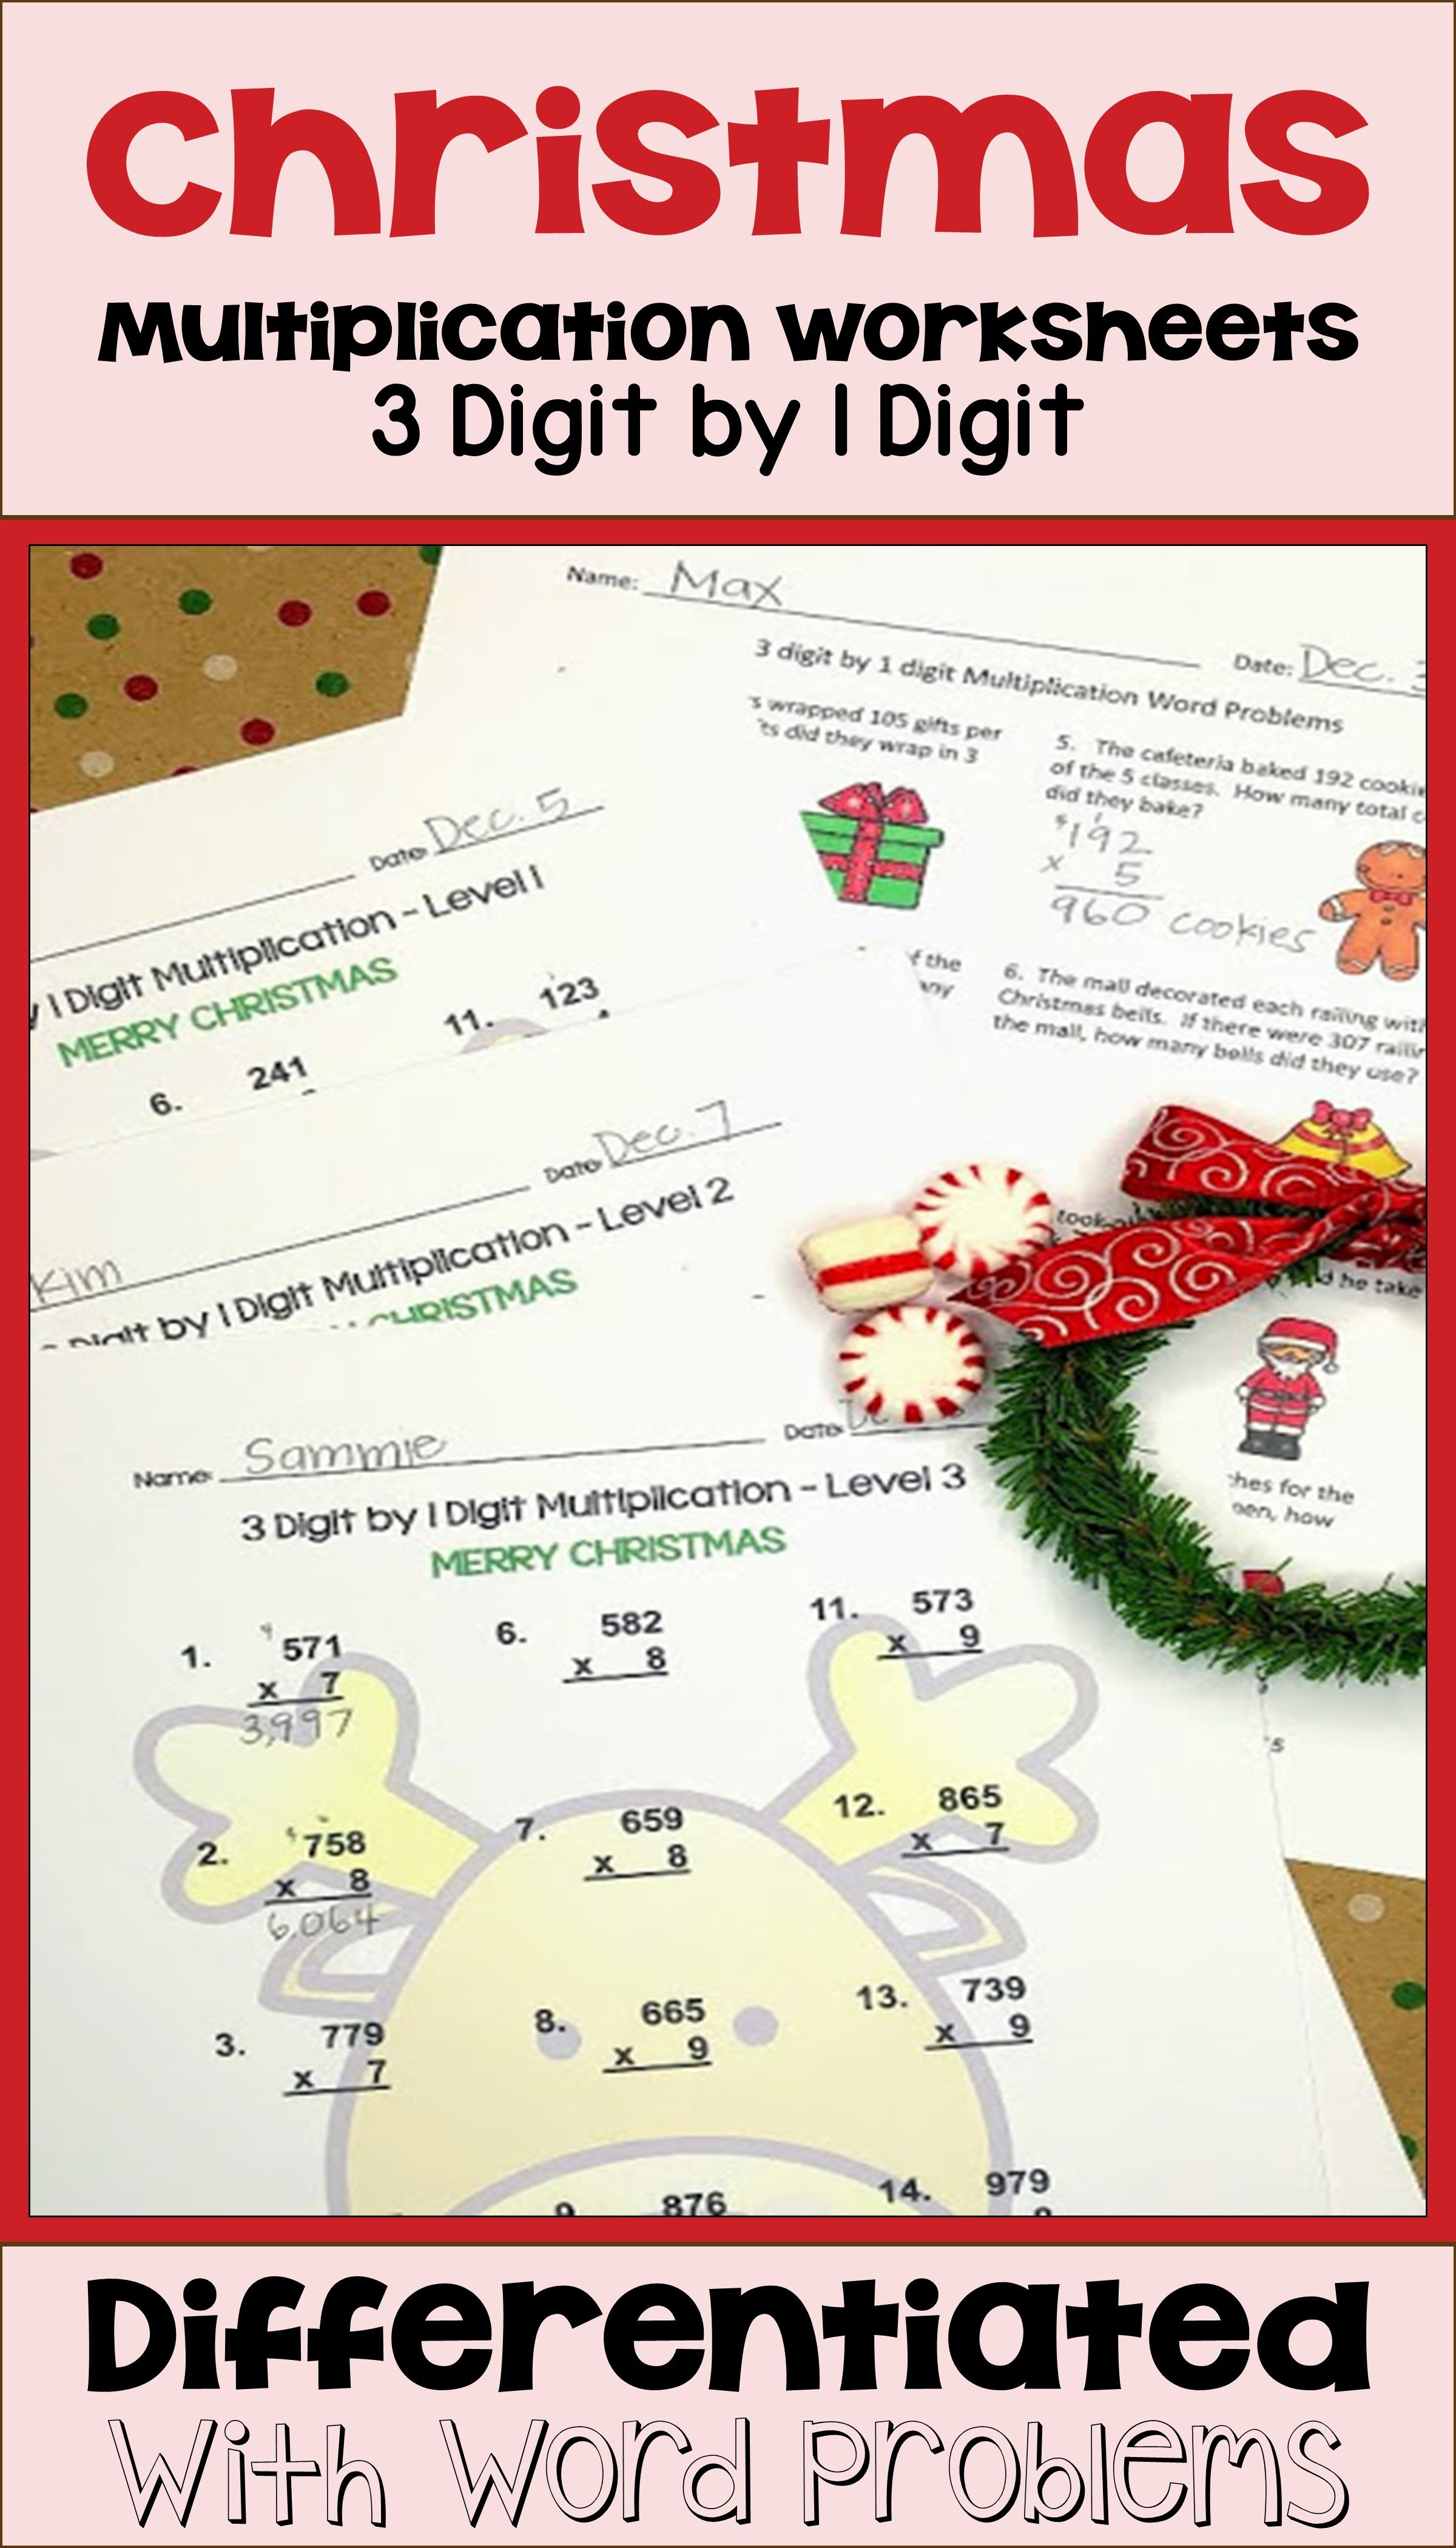 Christmas 3 Digit By 1 Digit Multiplication Worksheets